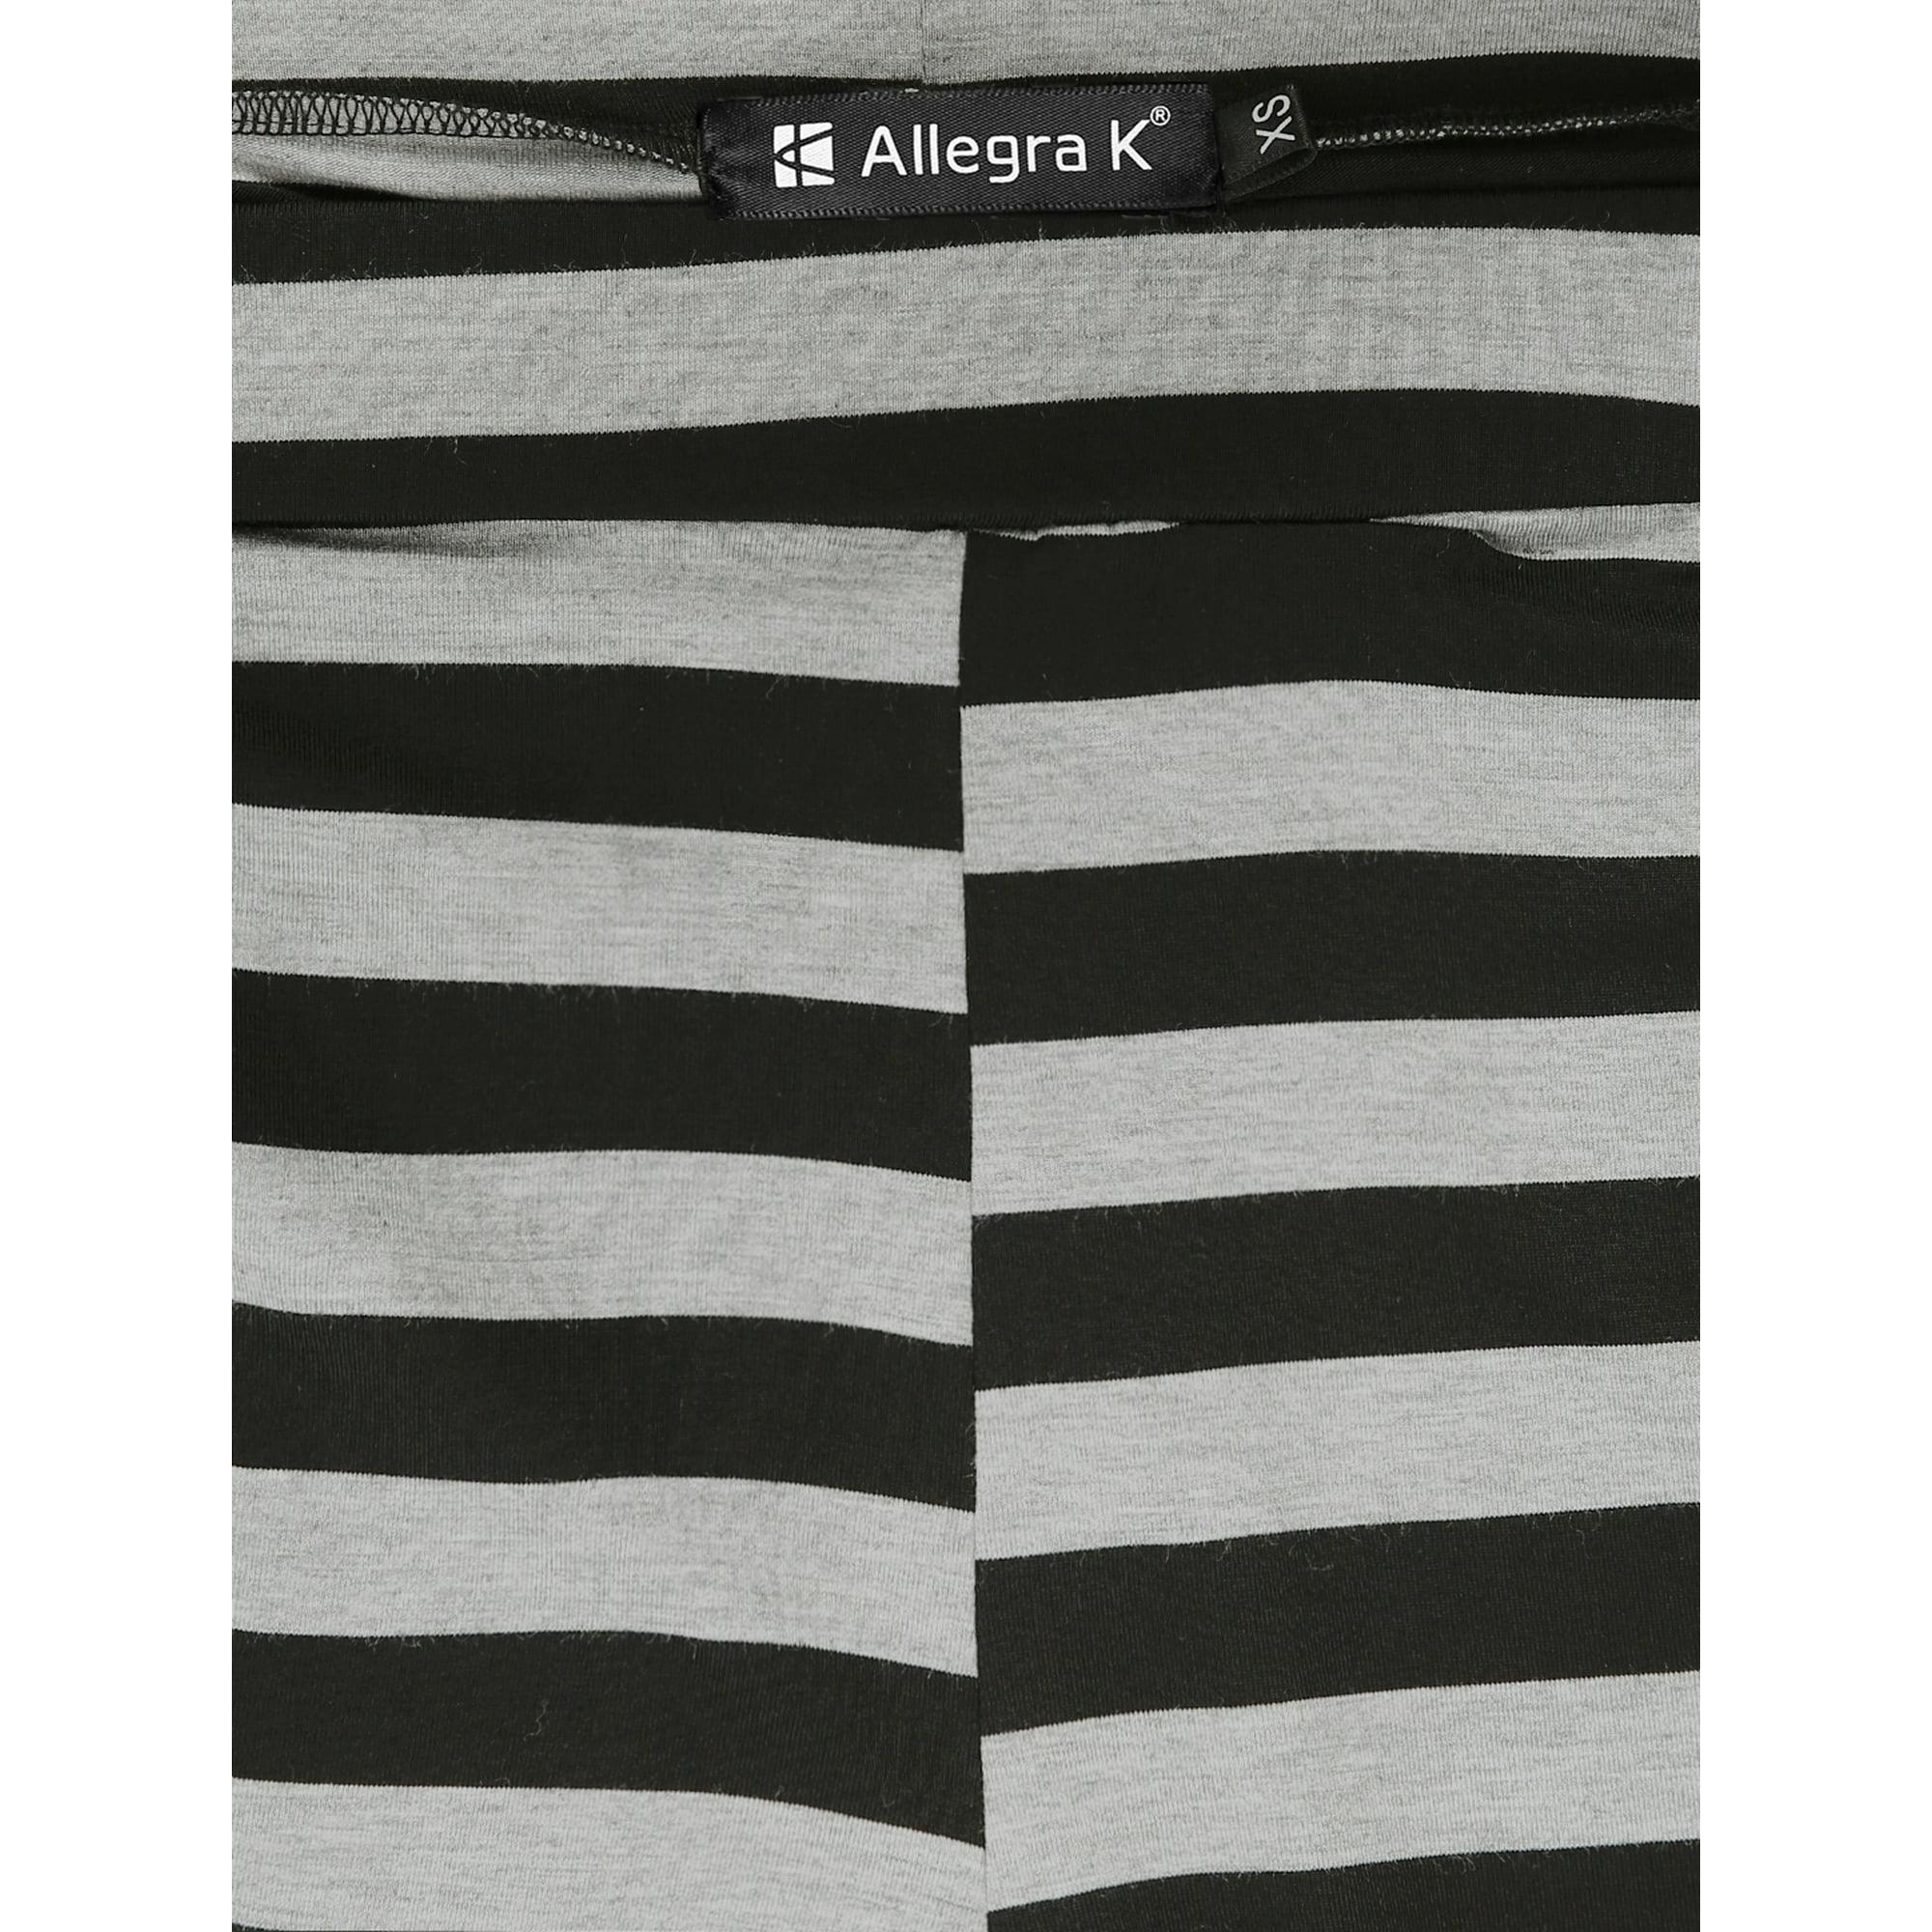 2a2bbeefe989d4 Women's Striped Elastic Waistband Knit Stirrup Leggings Black (Size XS / 2)  Black XL (US 18) | Walmart Canada